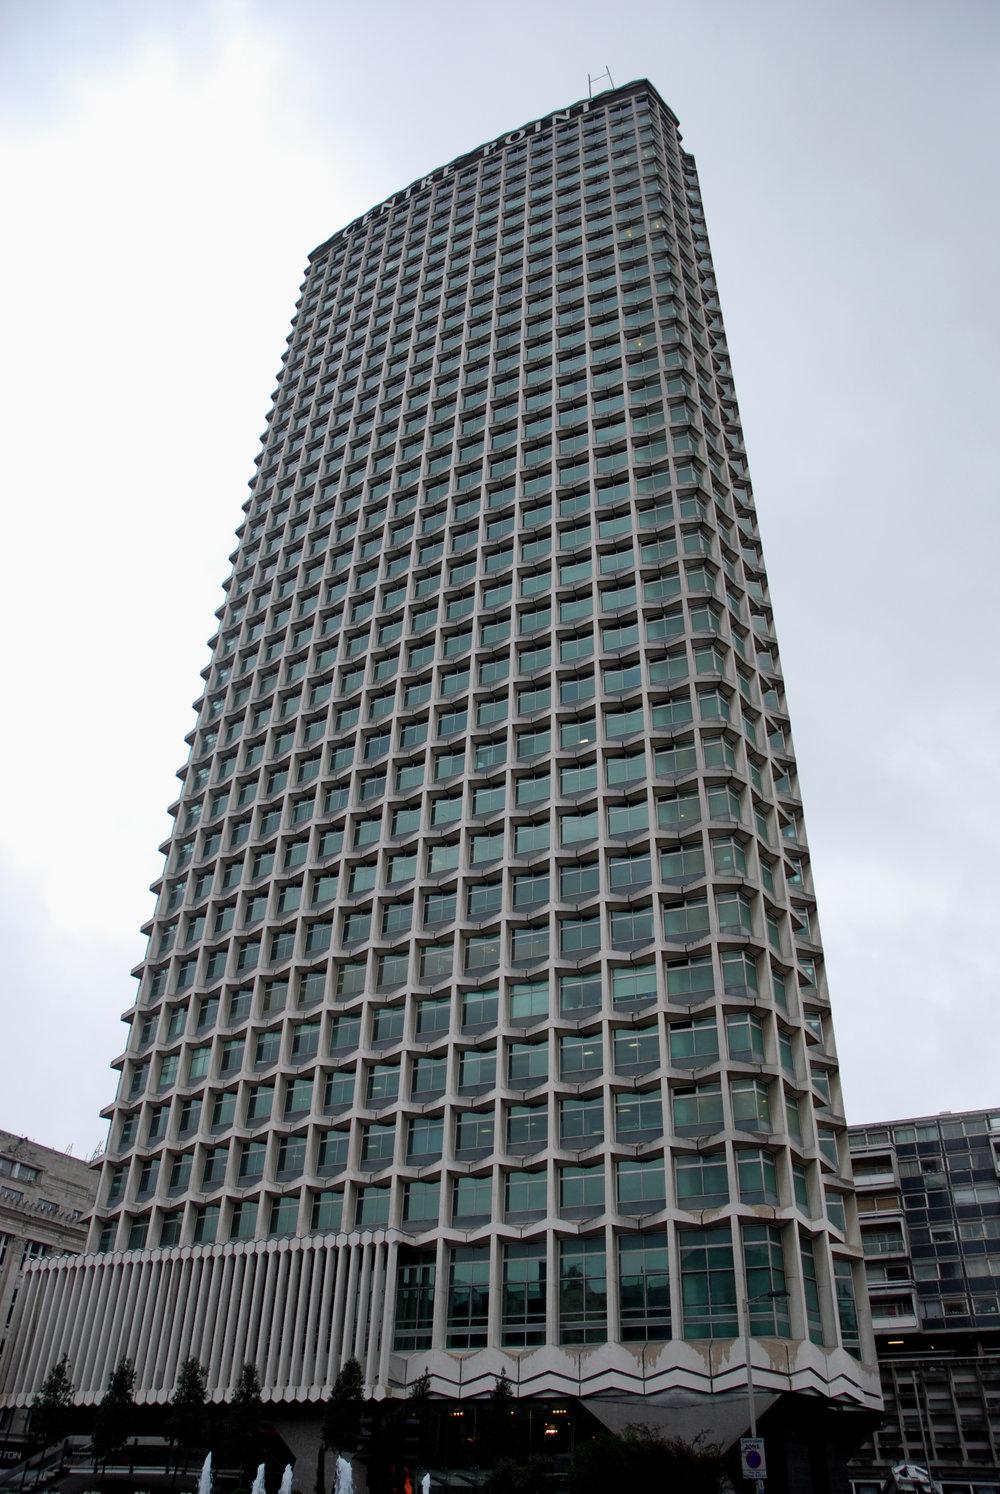 Tall_building_(3071109121).jpg